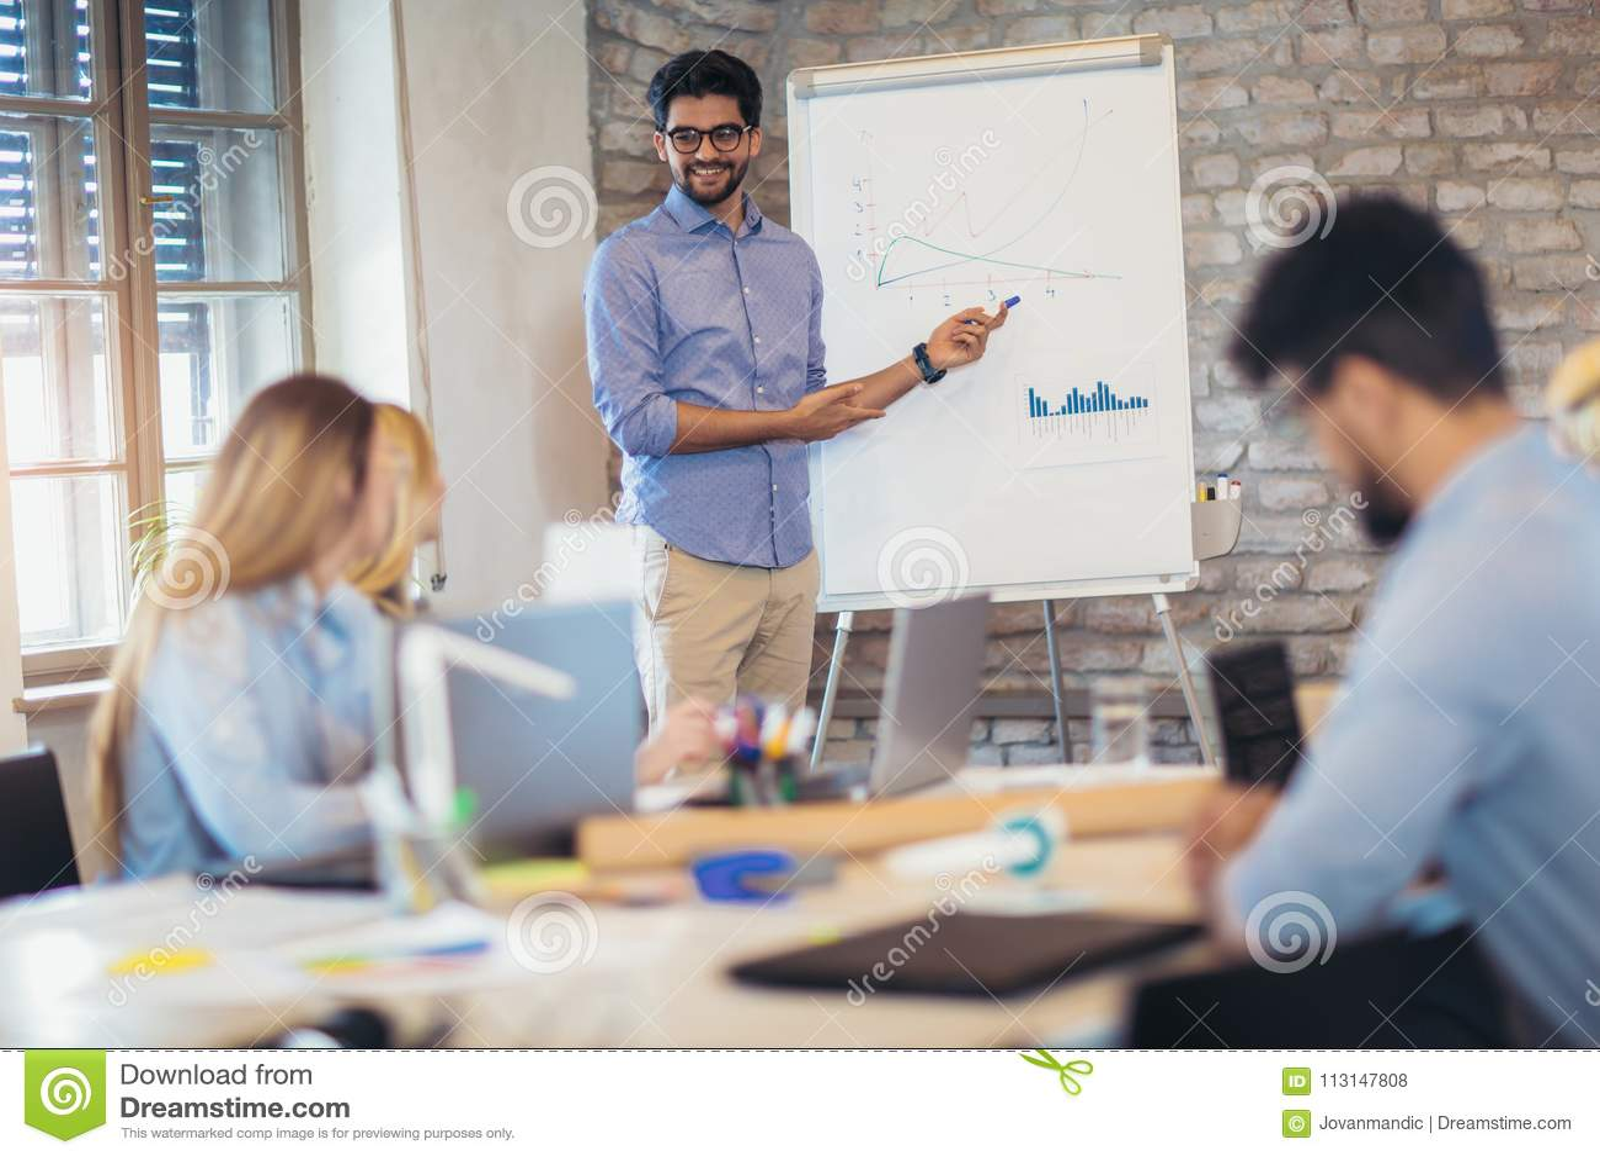 AffärsmanAt Whiteboard Giving presentation